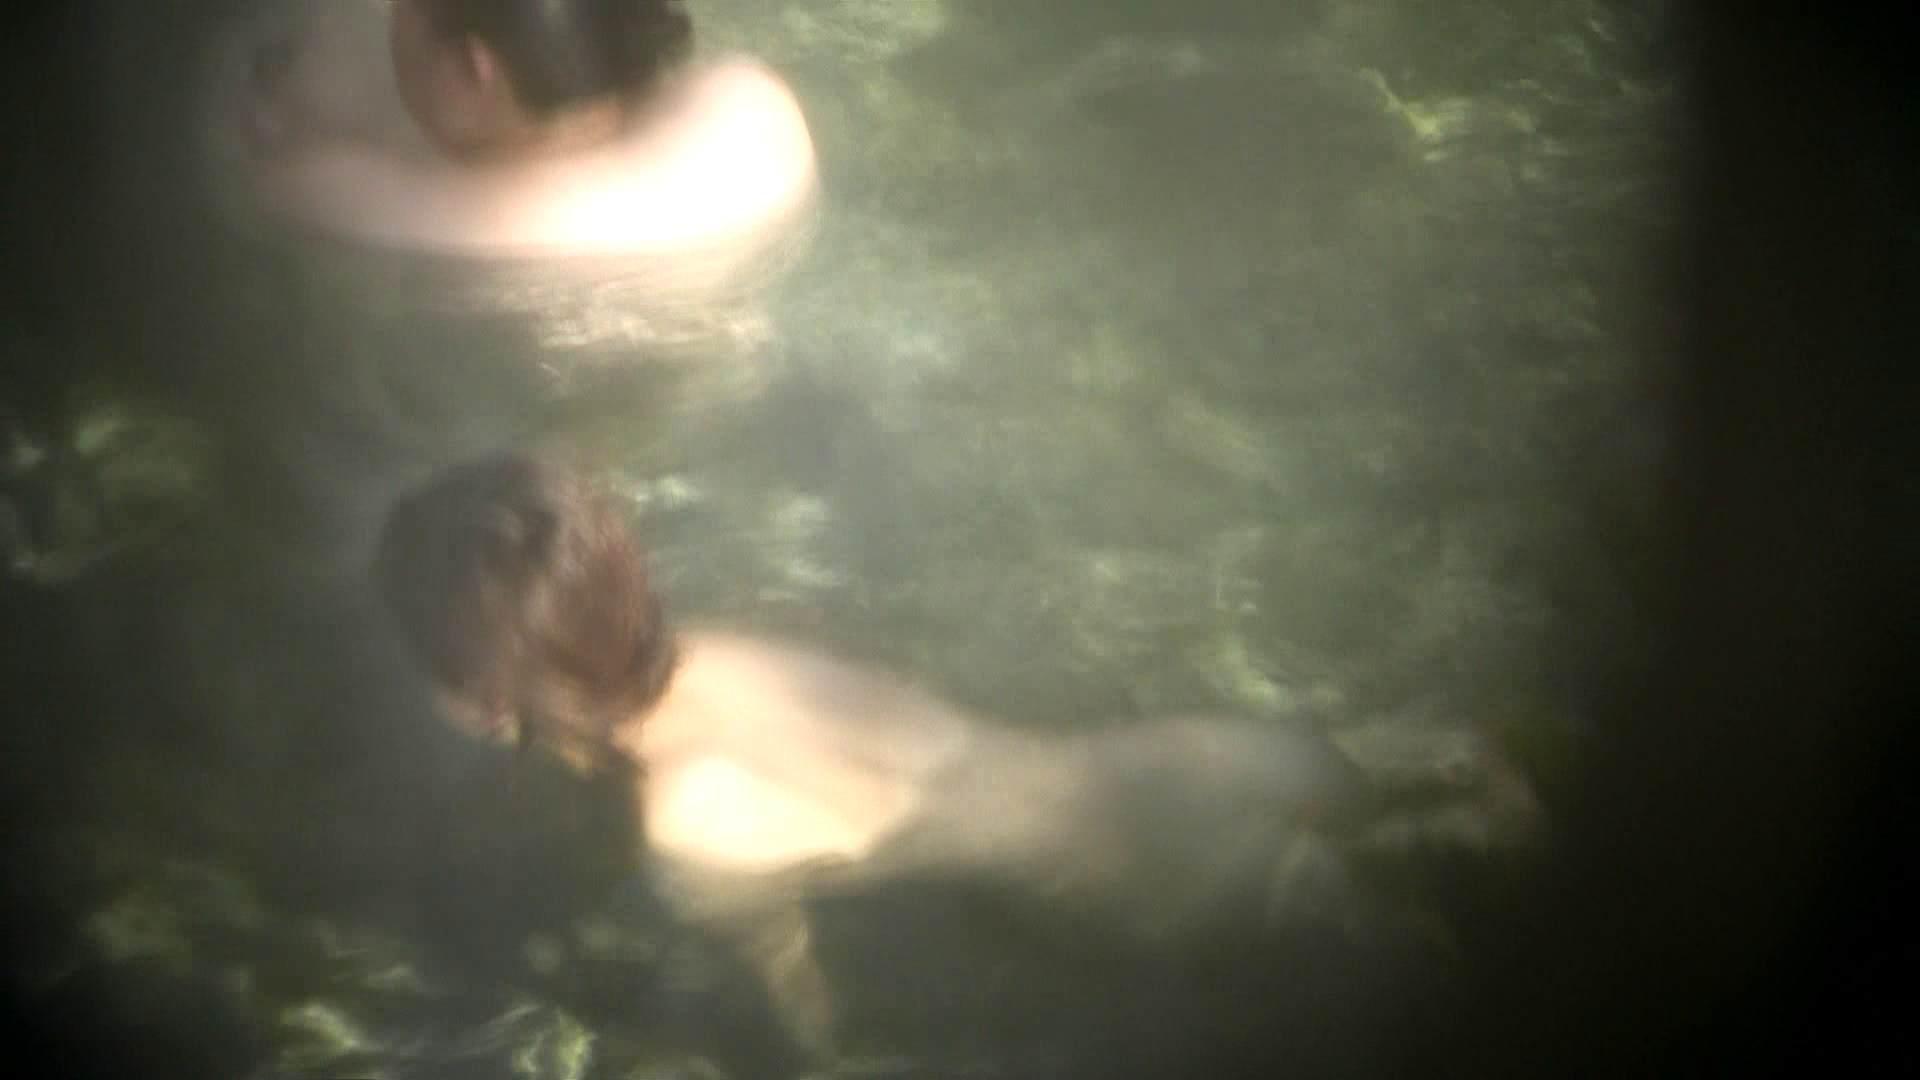 高画質露天女風呂観察 vol.005 OLのエロ生活 | 高画質  54連発 1